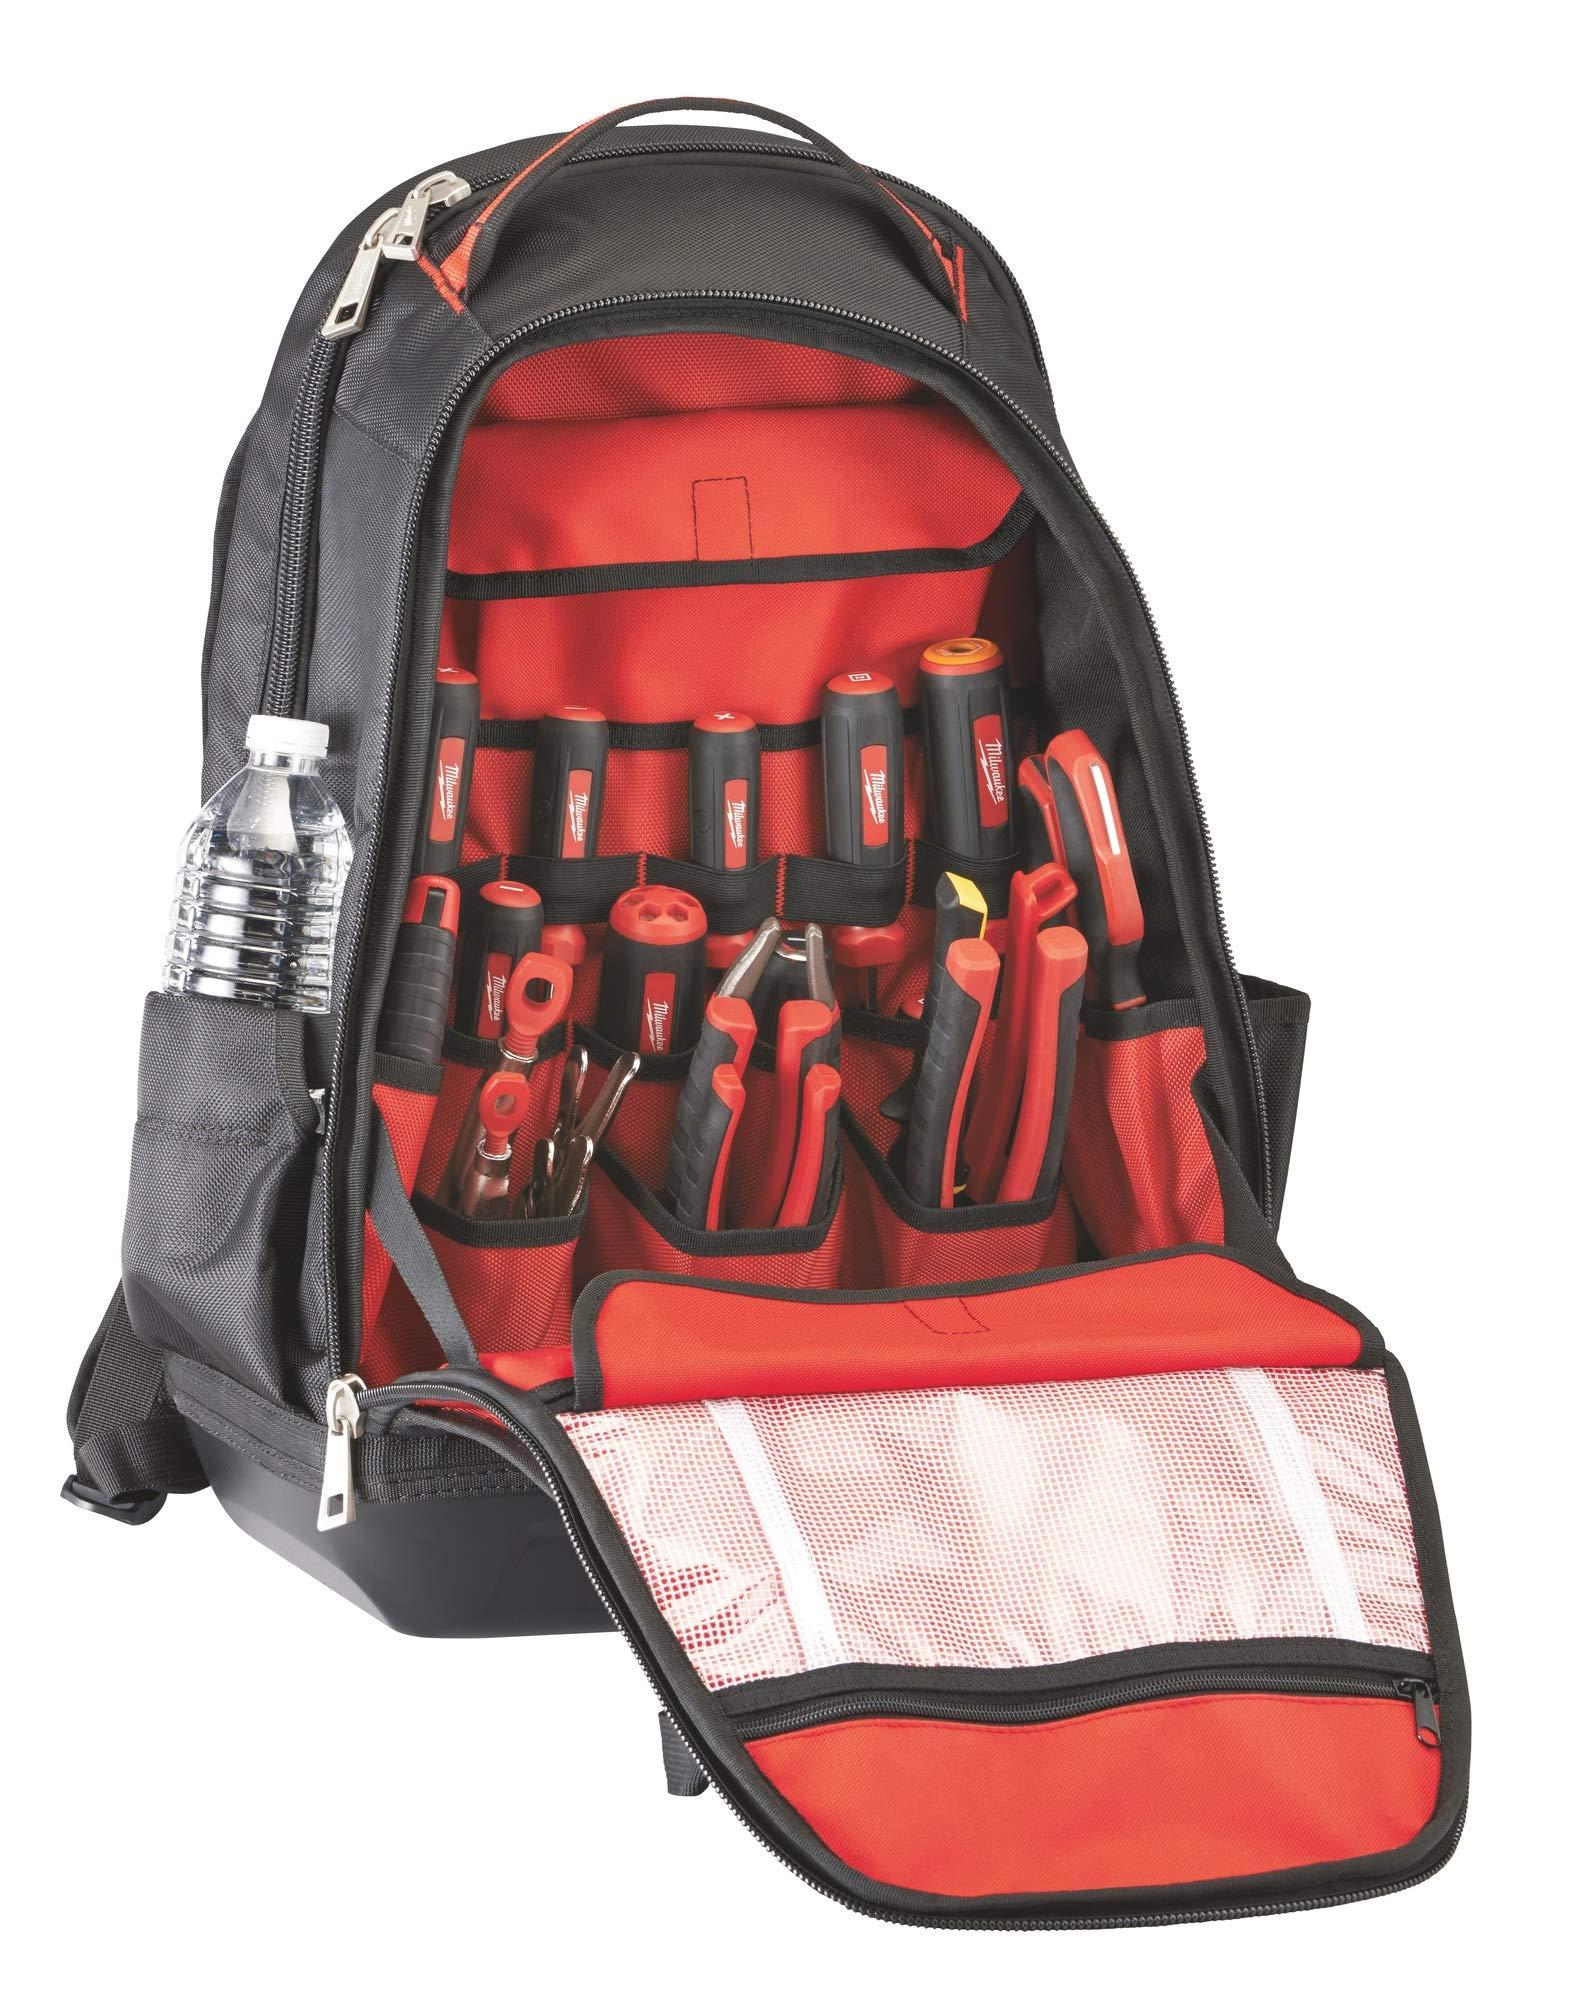 MILWAUKEE'S 48-22-8200 1680 Denier 35 Pocket Jobsite Backpack w/ Laptop Sleeve and Molded Plastic Base